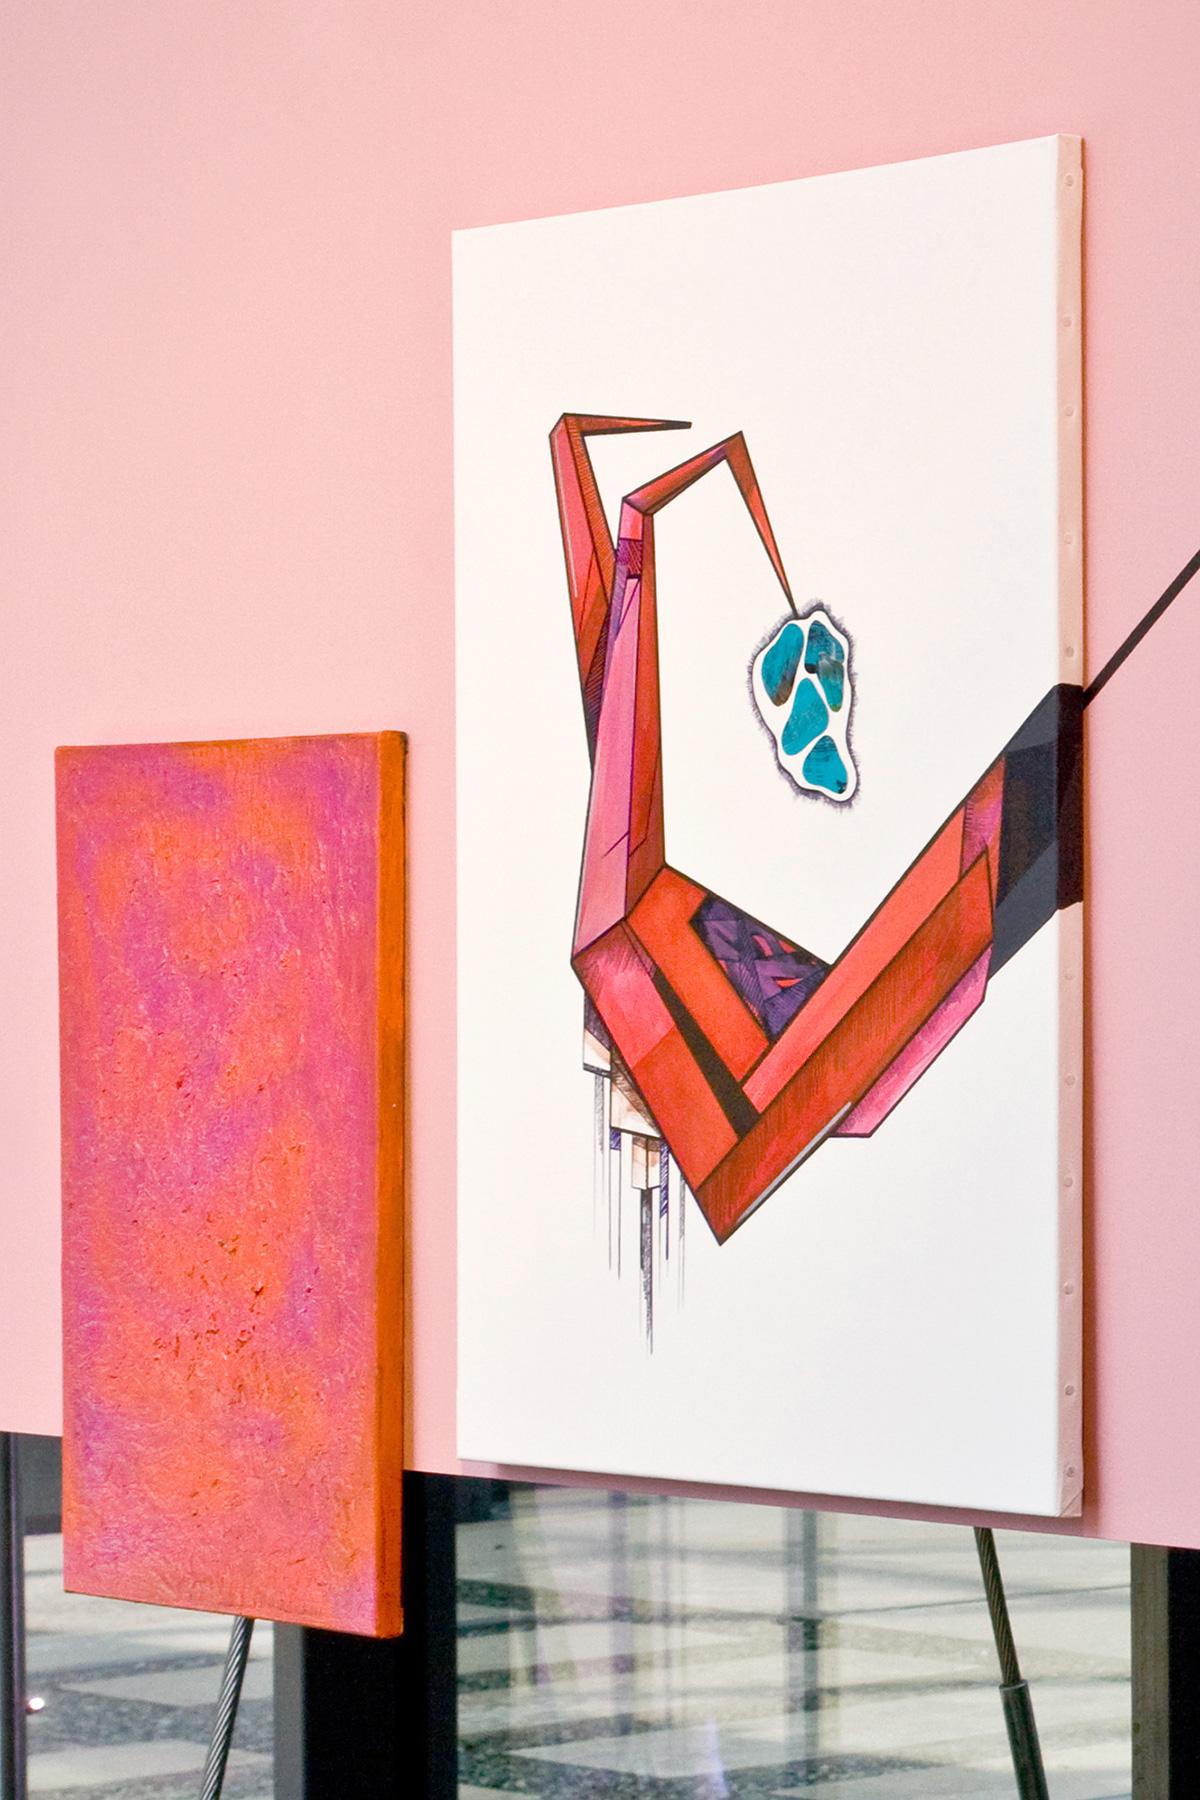 Ewa Doroszenko - Future sex based on Parade amoureuse by Francis Picabia - painting installation